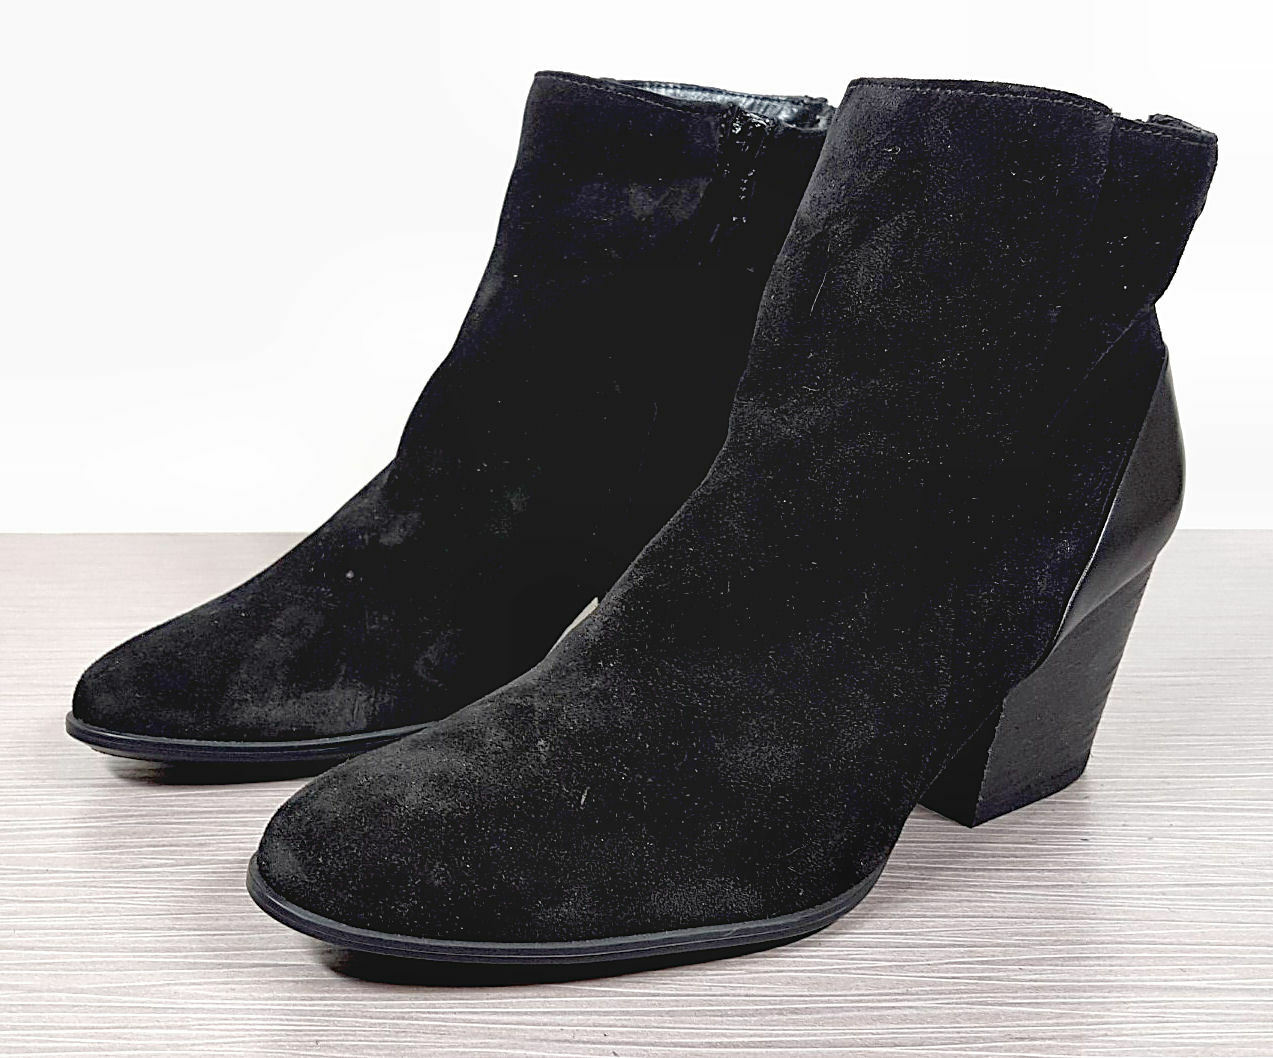 Paul Green 'Jada' Water Resistant Bootie, Black, Womens size 6 UK / 8.5 US